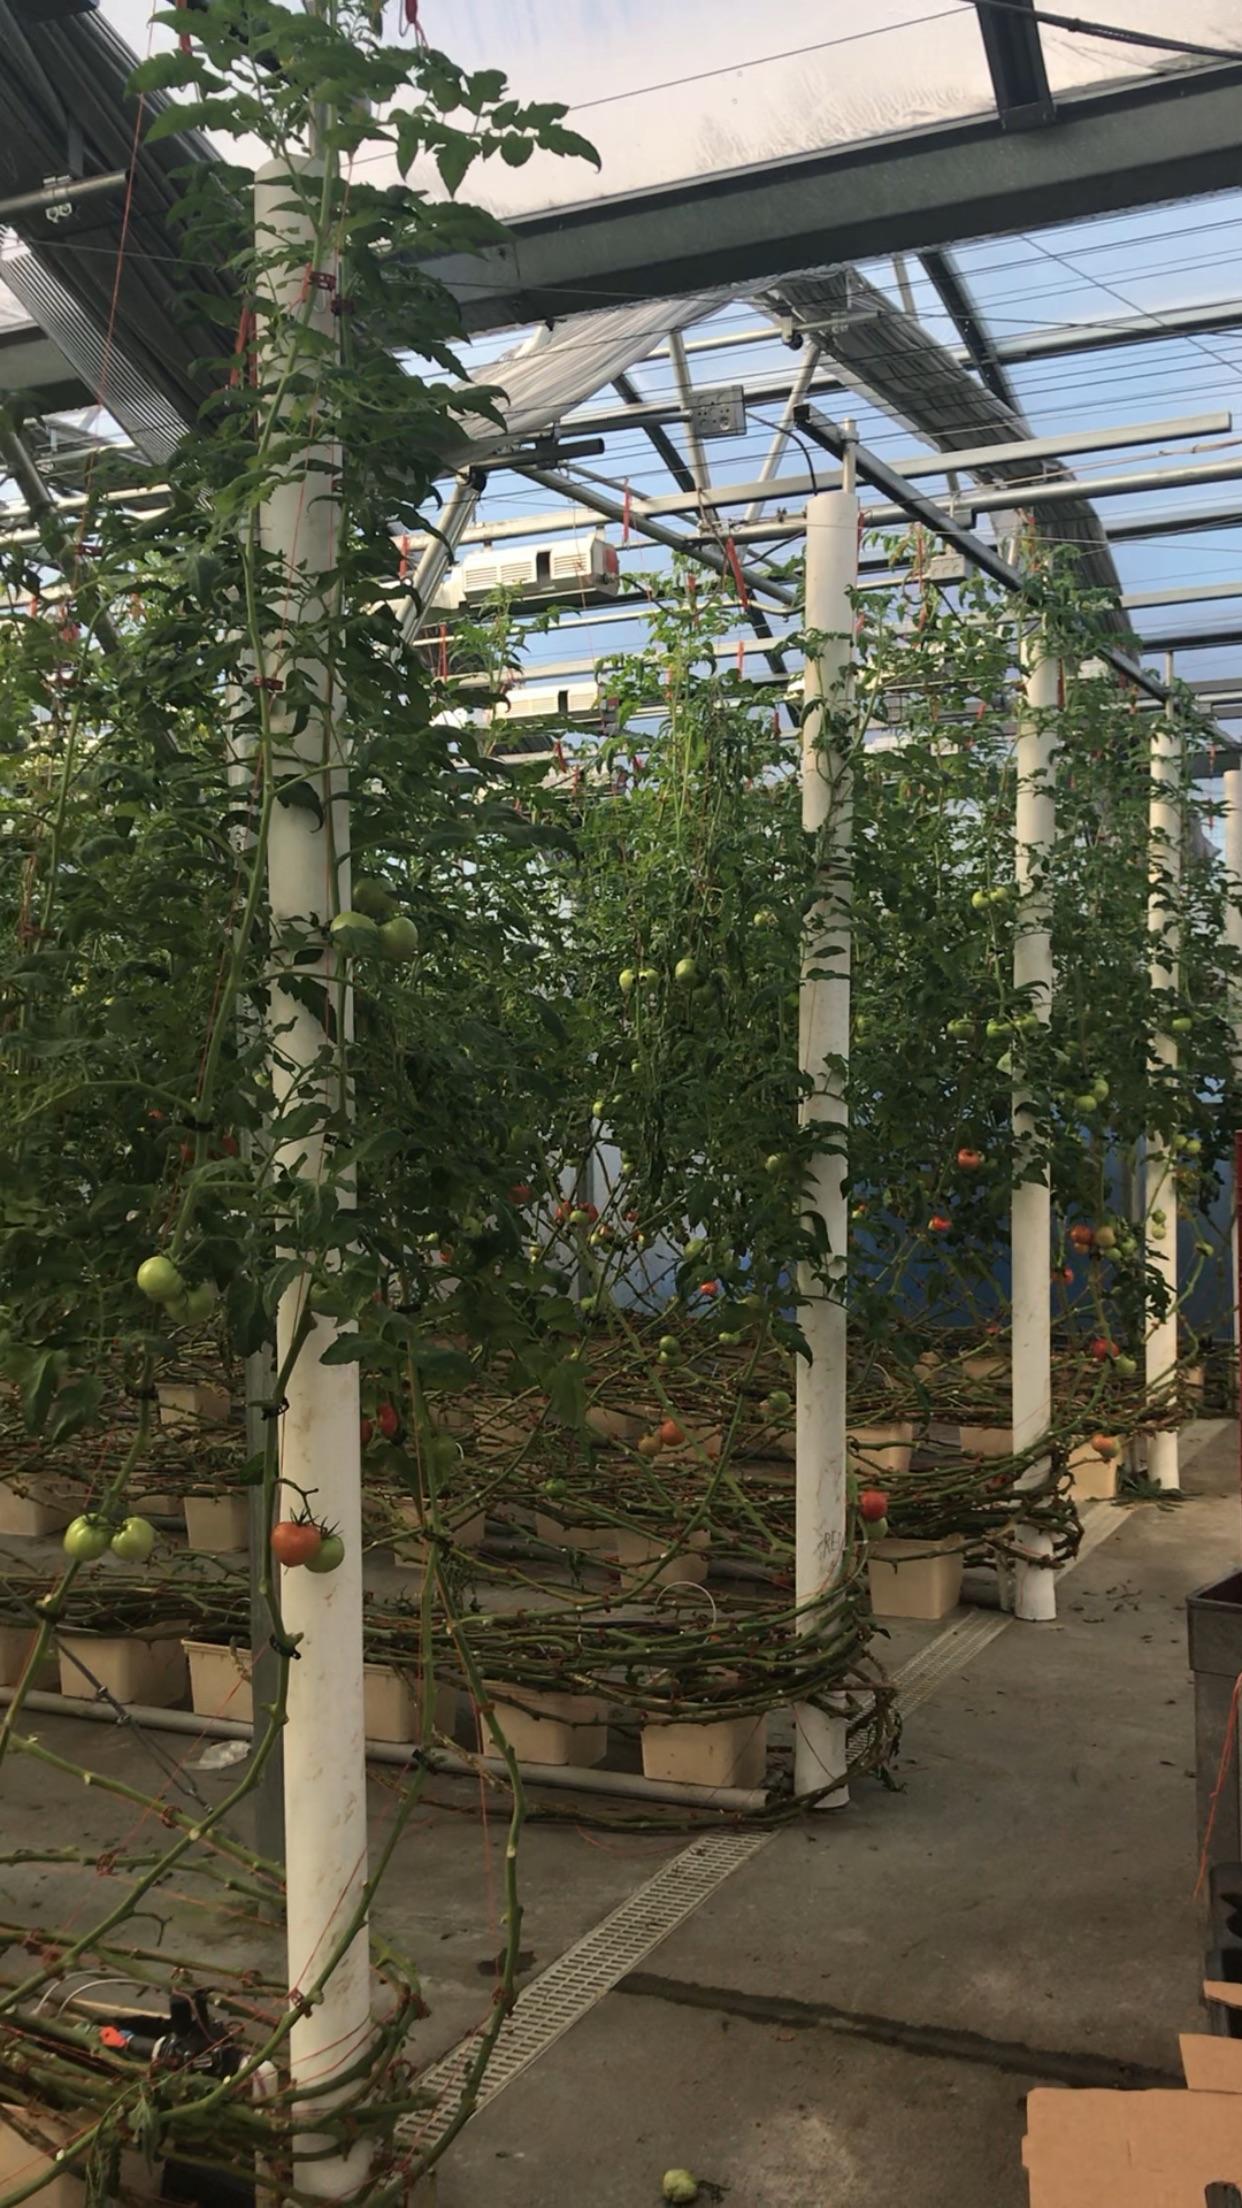 Hydroponic tomatos grown year-round!